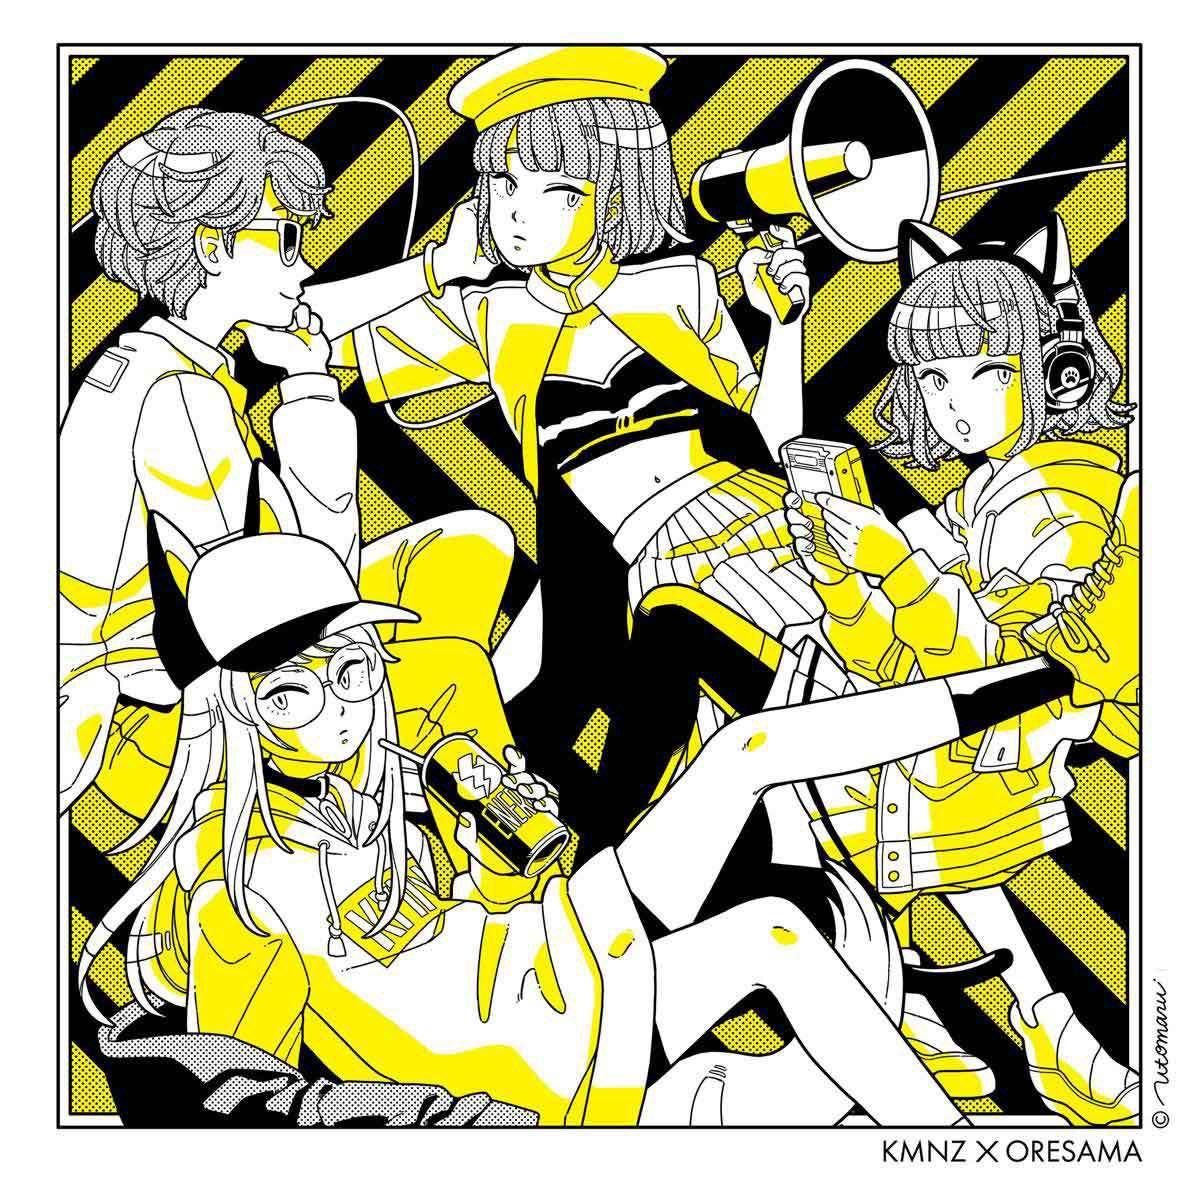 『KMNZ × ORESAMA - ファジータウン』収録の『ファジータウン』ジャケット